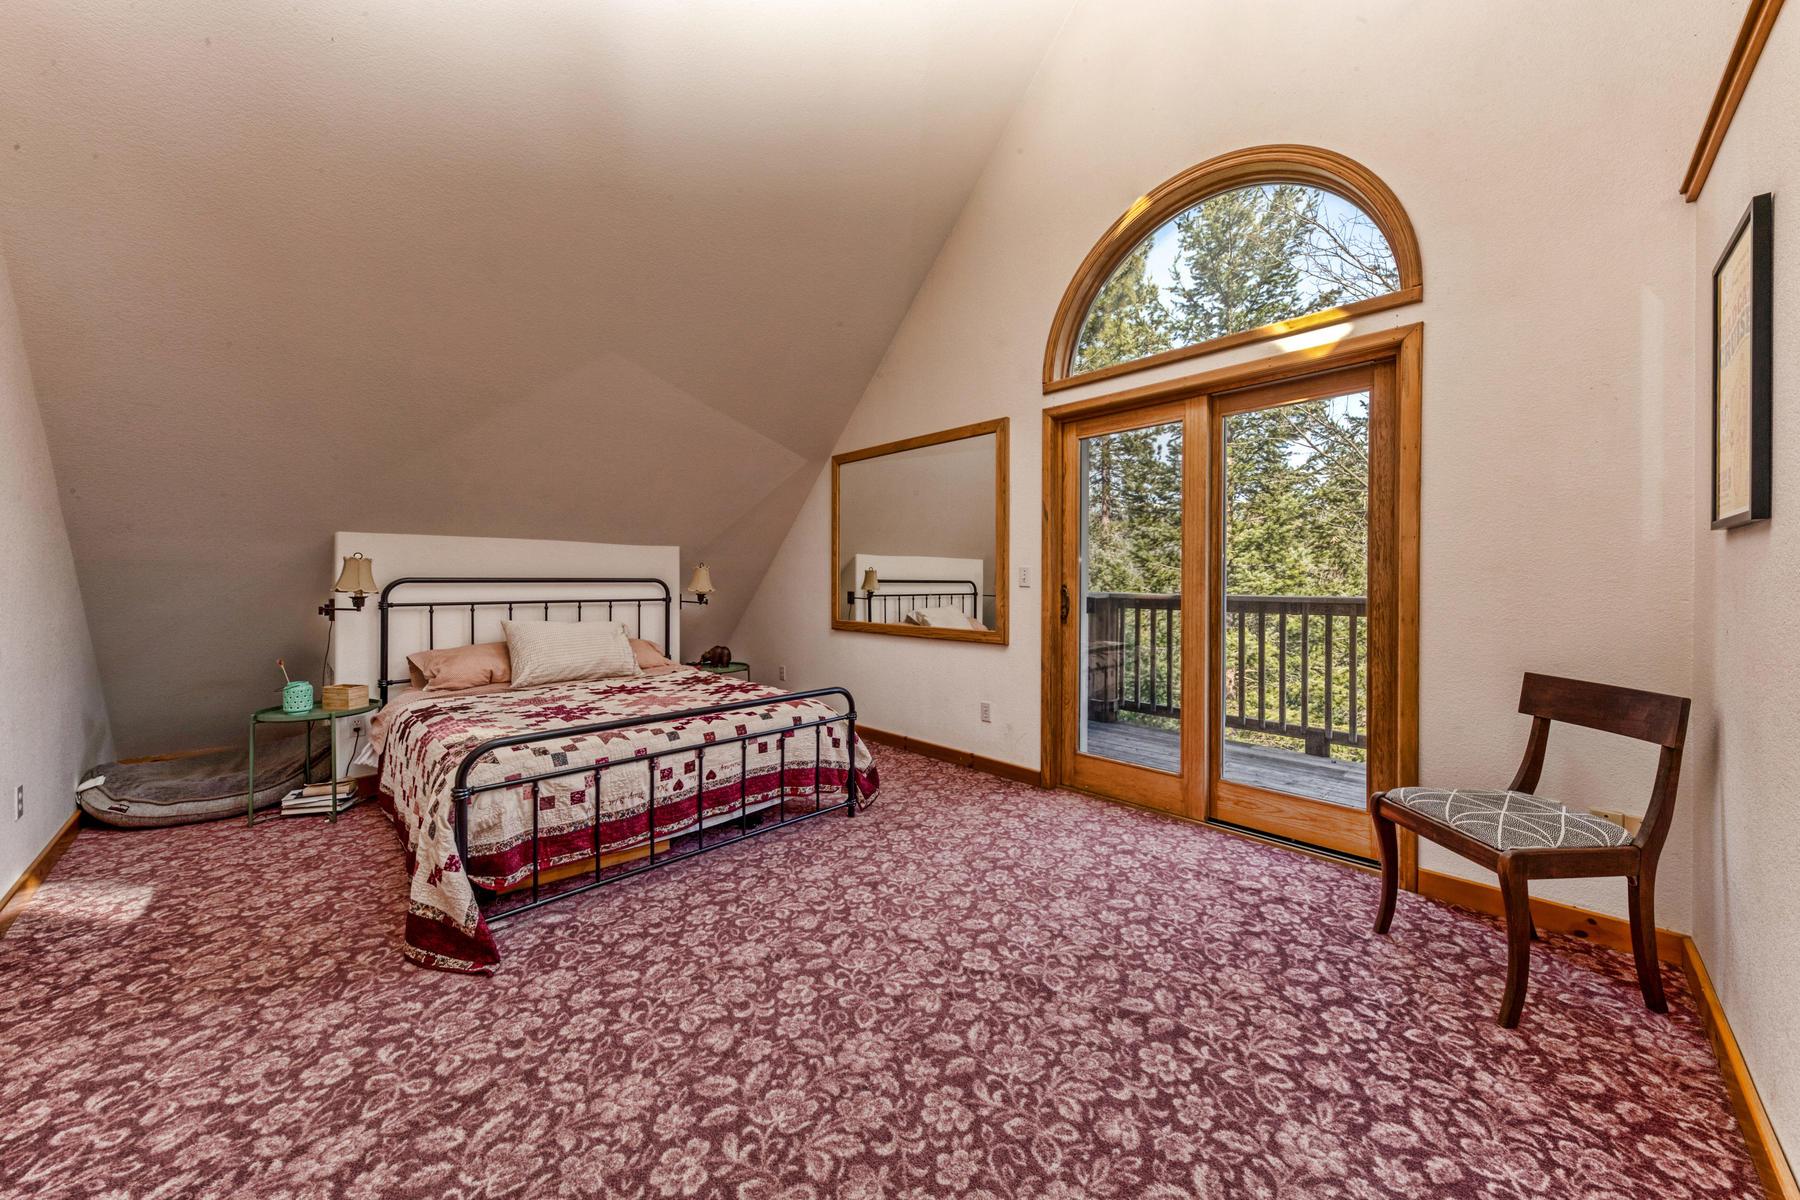 Additional photo for property listing at 2425 Ridgerun Road, Quincy, CA 95971 2425 Ridgerun Road Quincy, California 95971 Estados Unidos